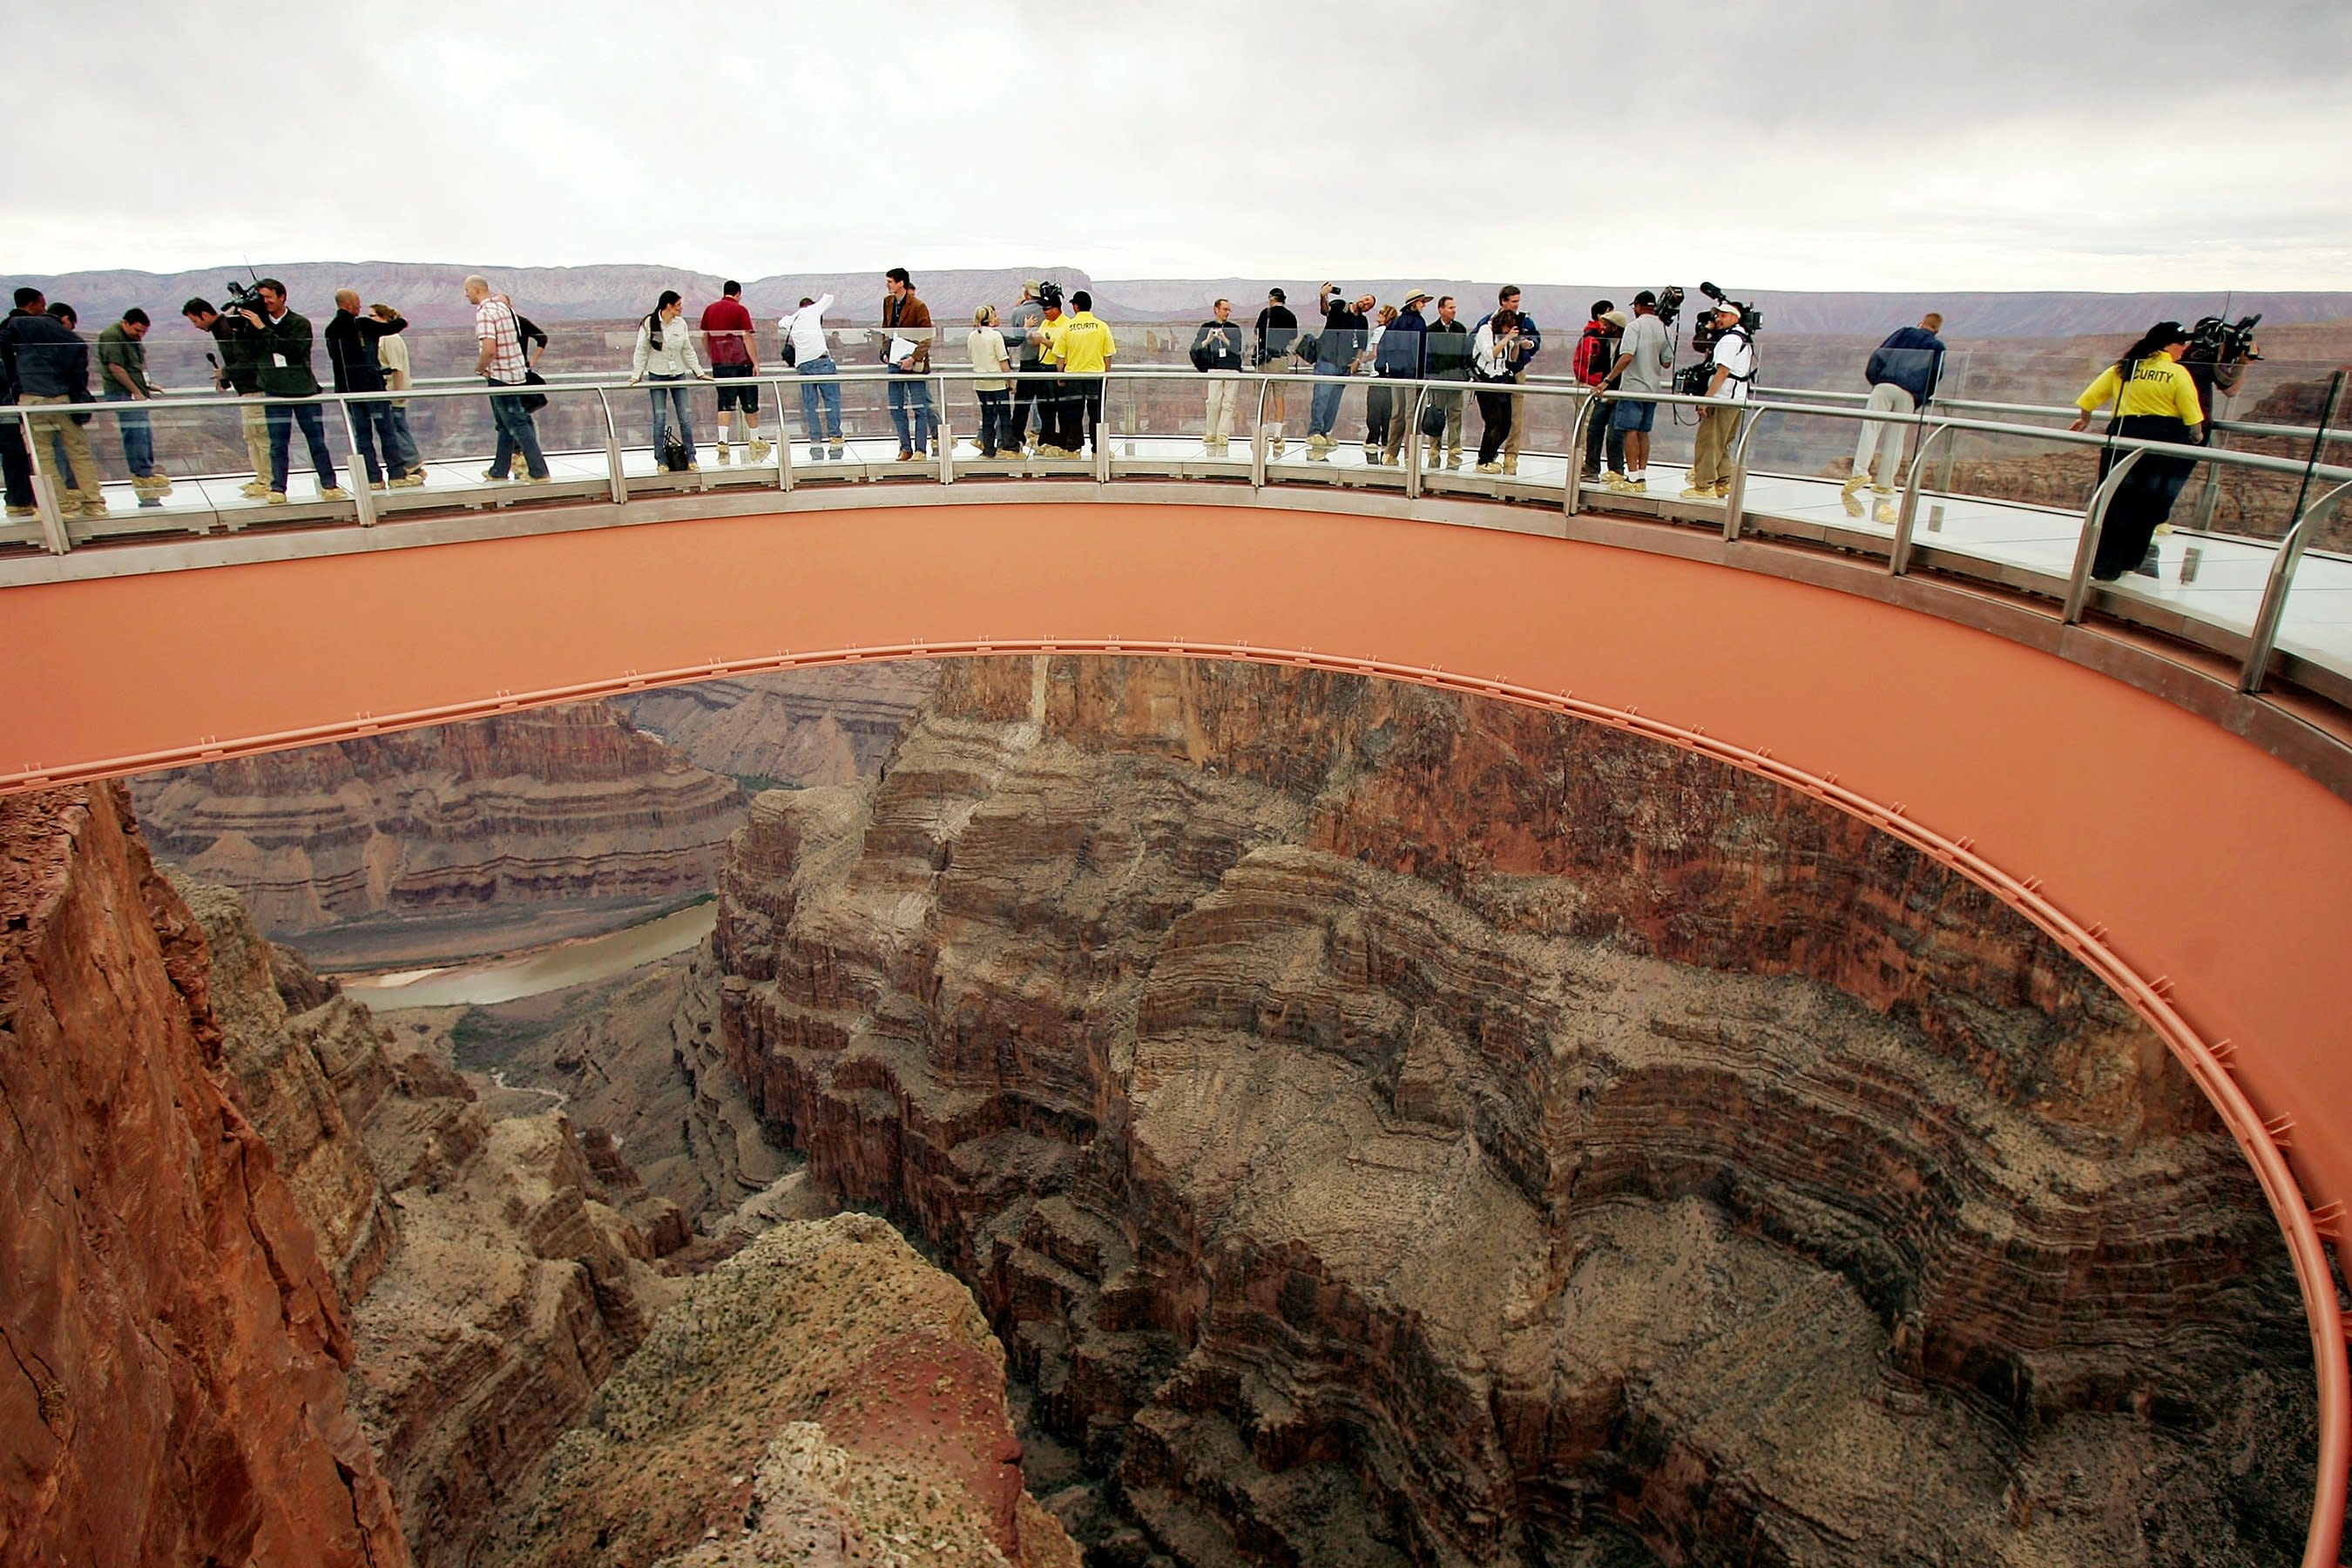 28 Year Old Man Dies At Grand Canyon Skywalk